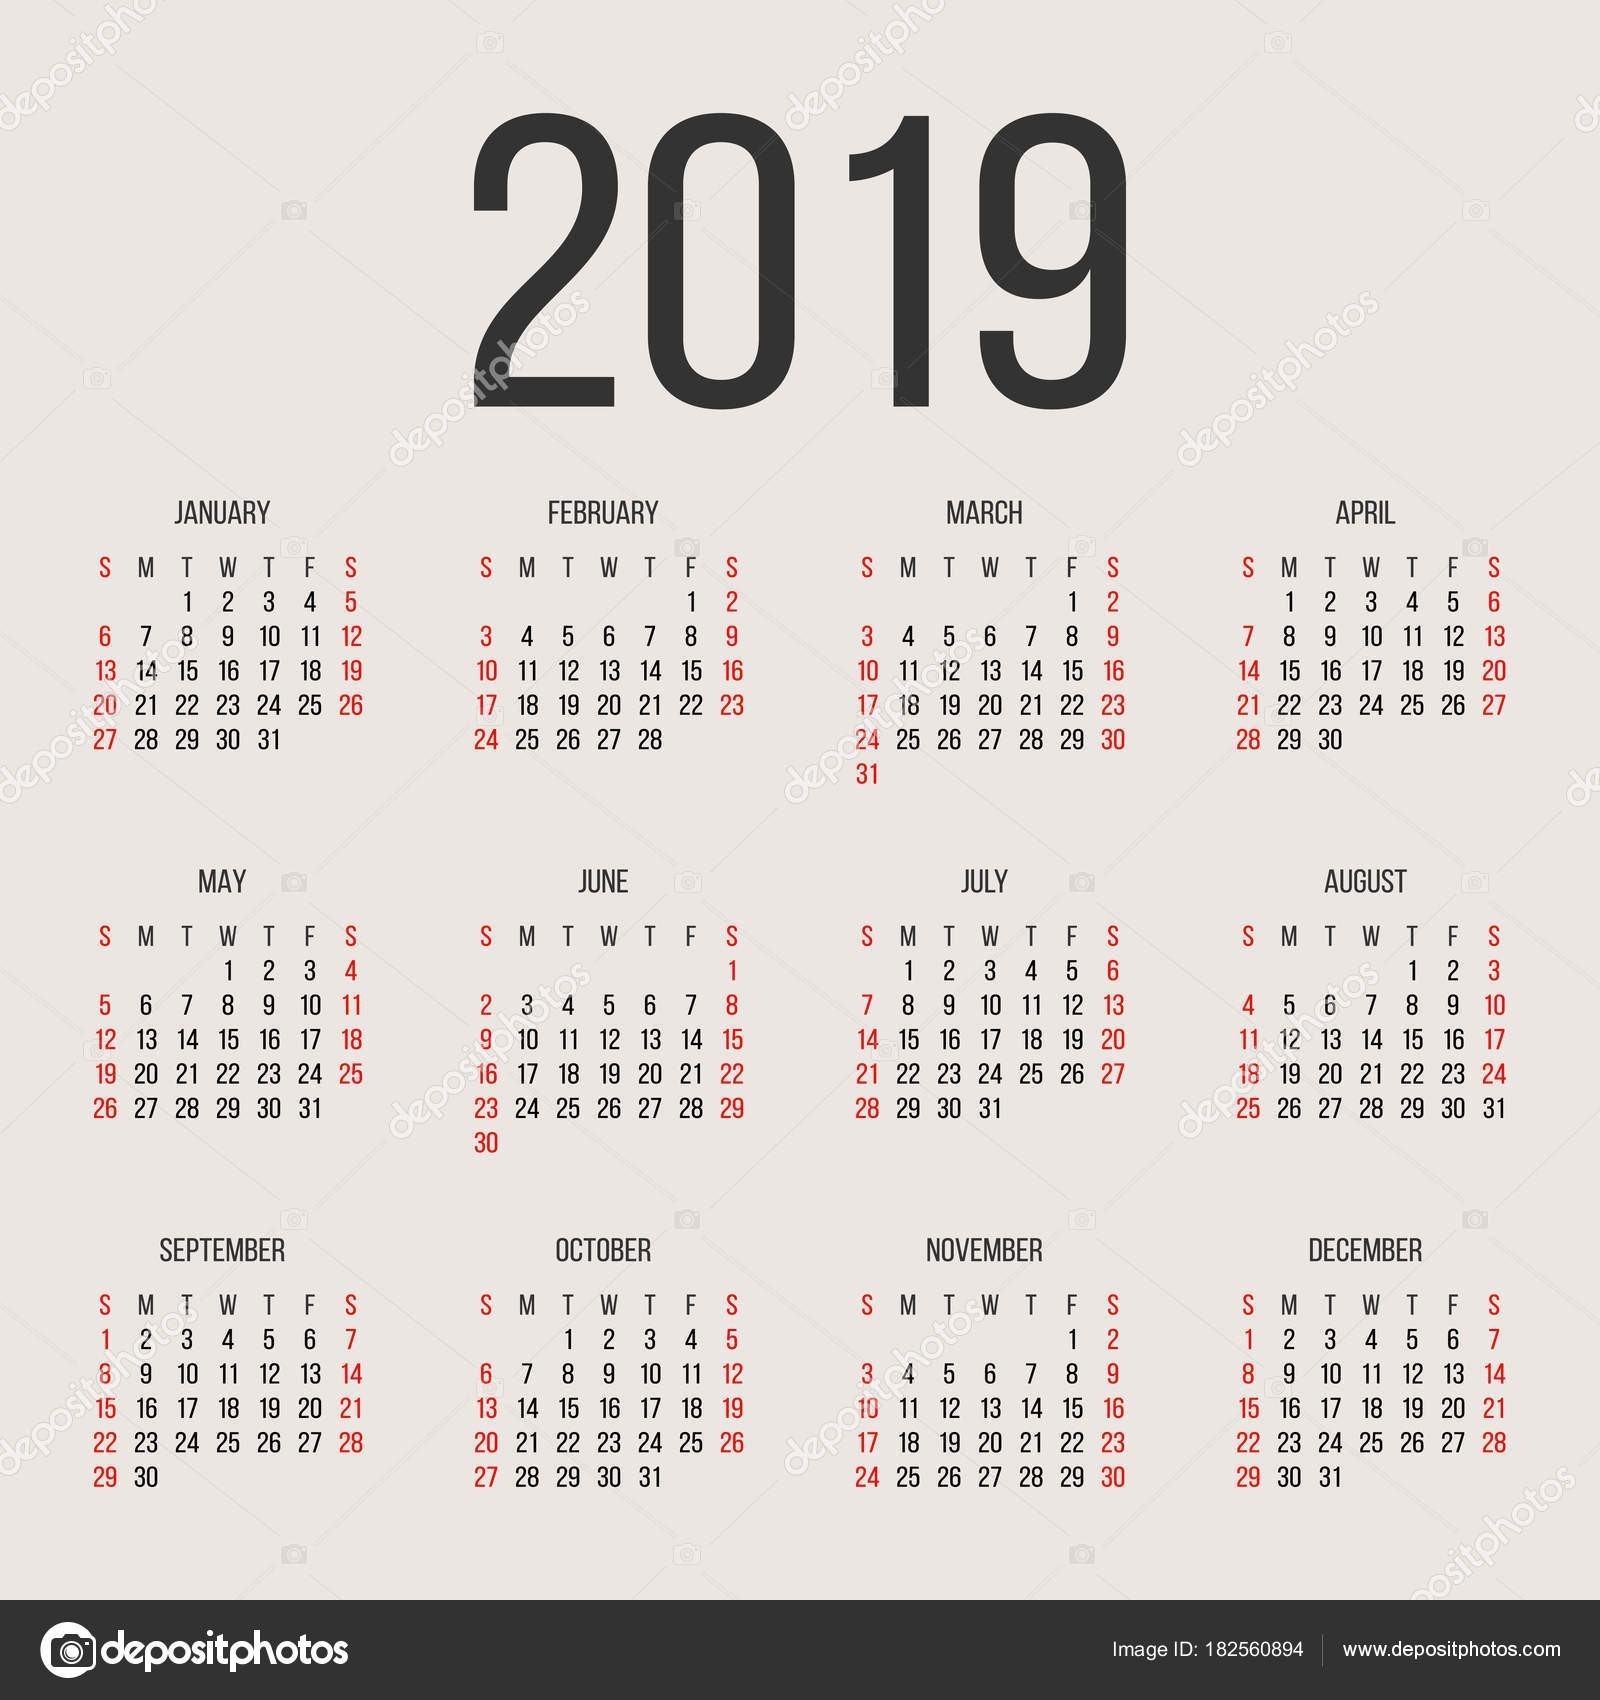 calendario 2019 para imprimir feriados mexico mas reciente realmente esto calendario 2019 en ingles para imprimir of calendario 2019 para imprimir feriados mexico